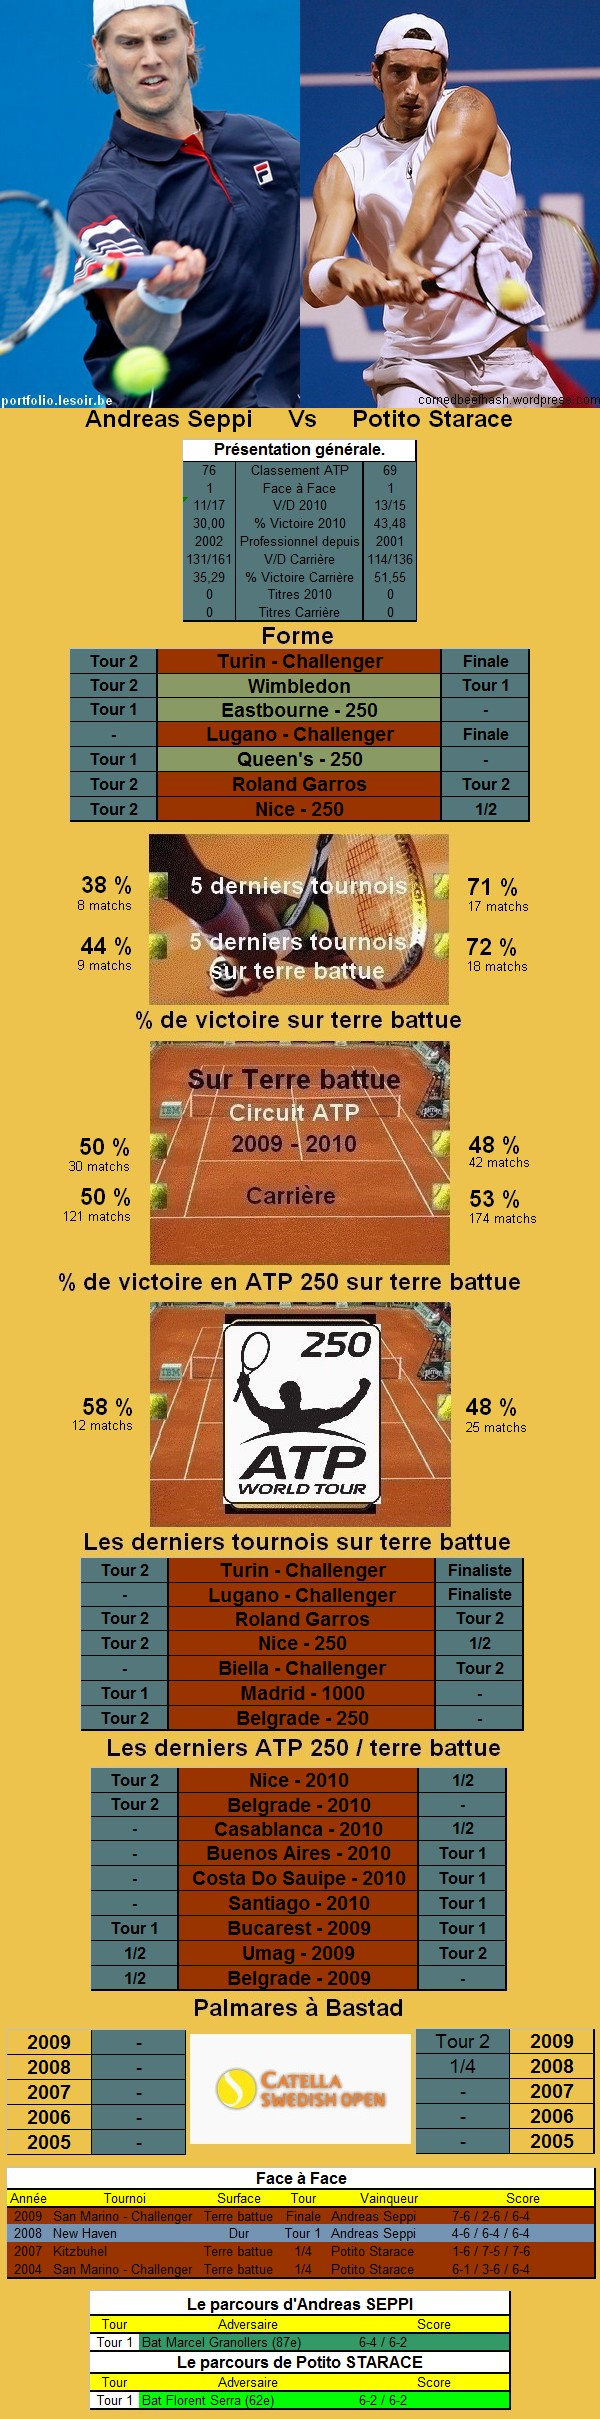 Statistiques tennis de Seppi contre Starace à Bastad